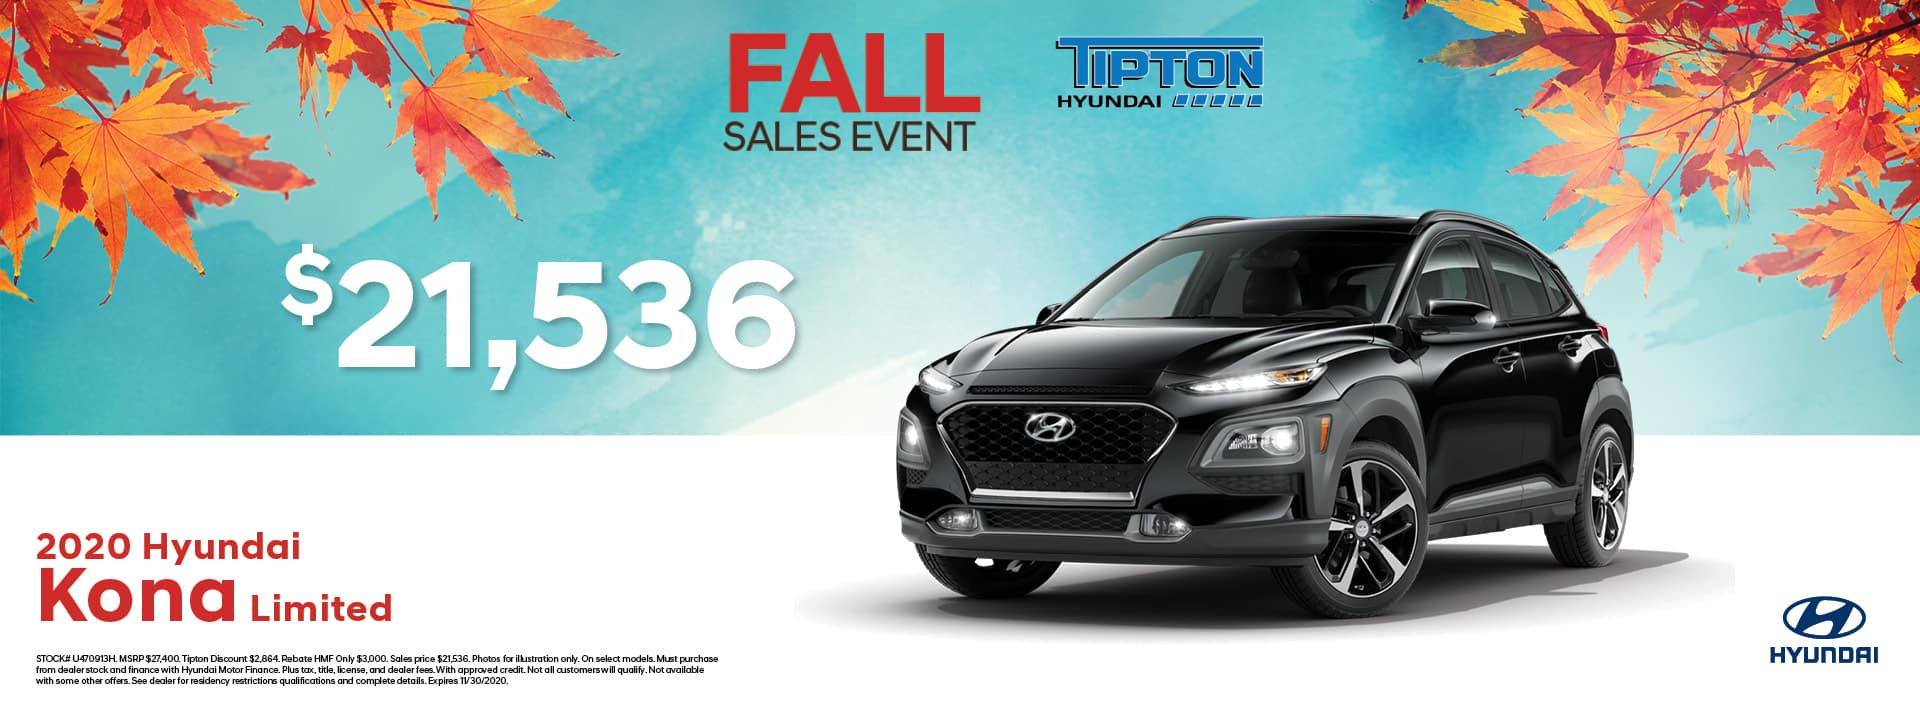 Tipton Hyundai | Hyundai Kona | Toronto, ON